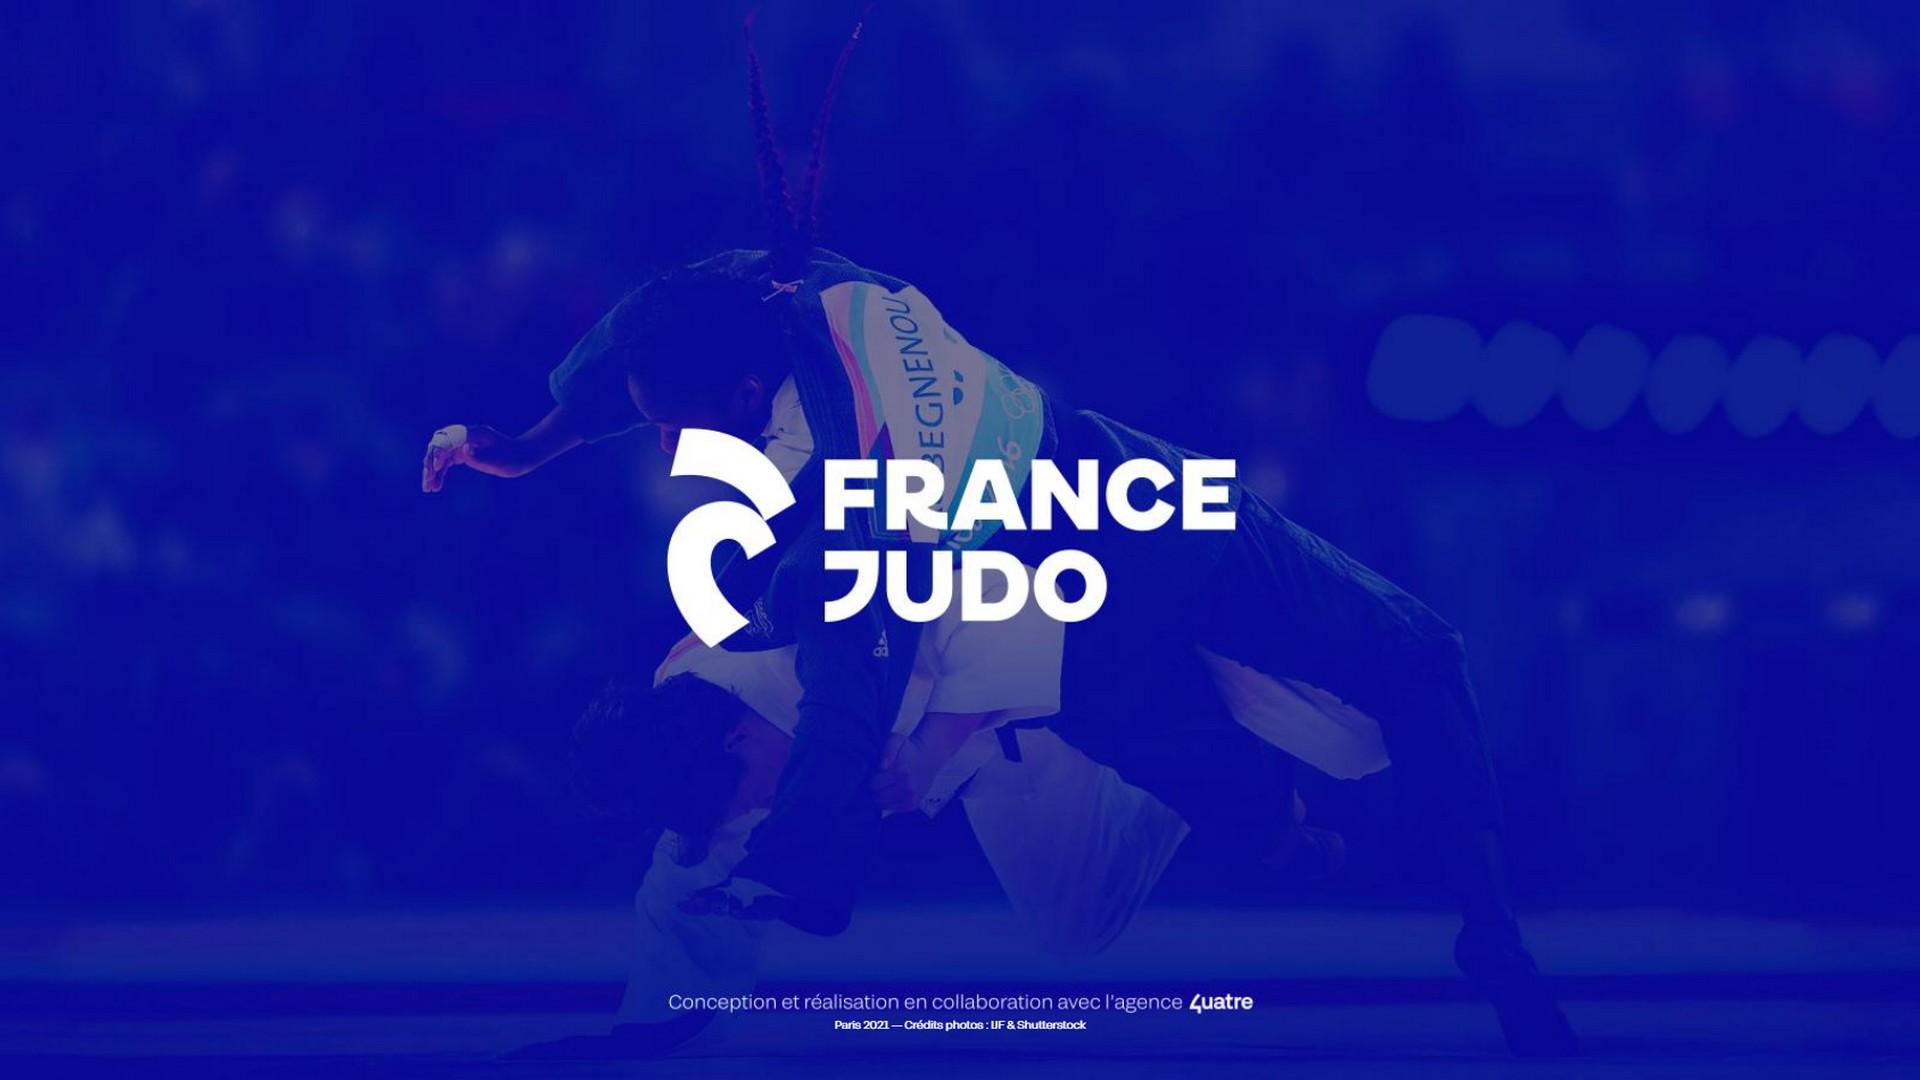 Judo (1) Logo France Judo